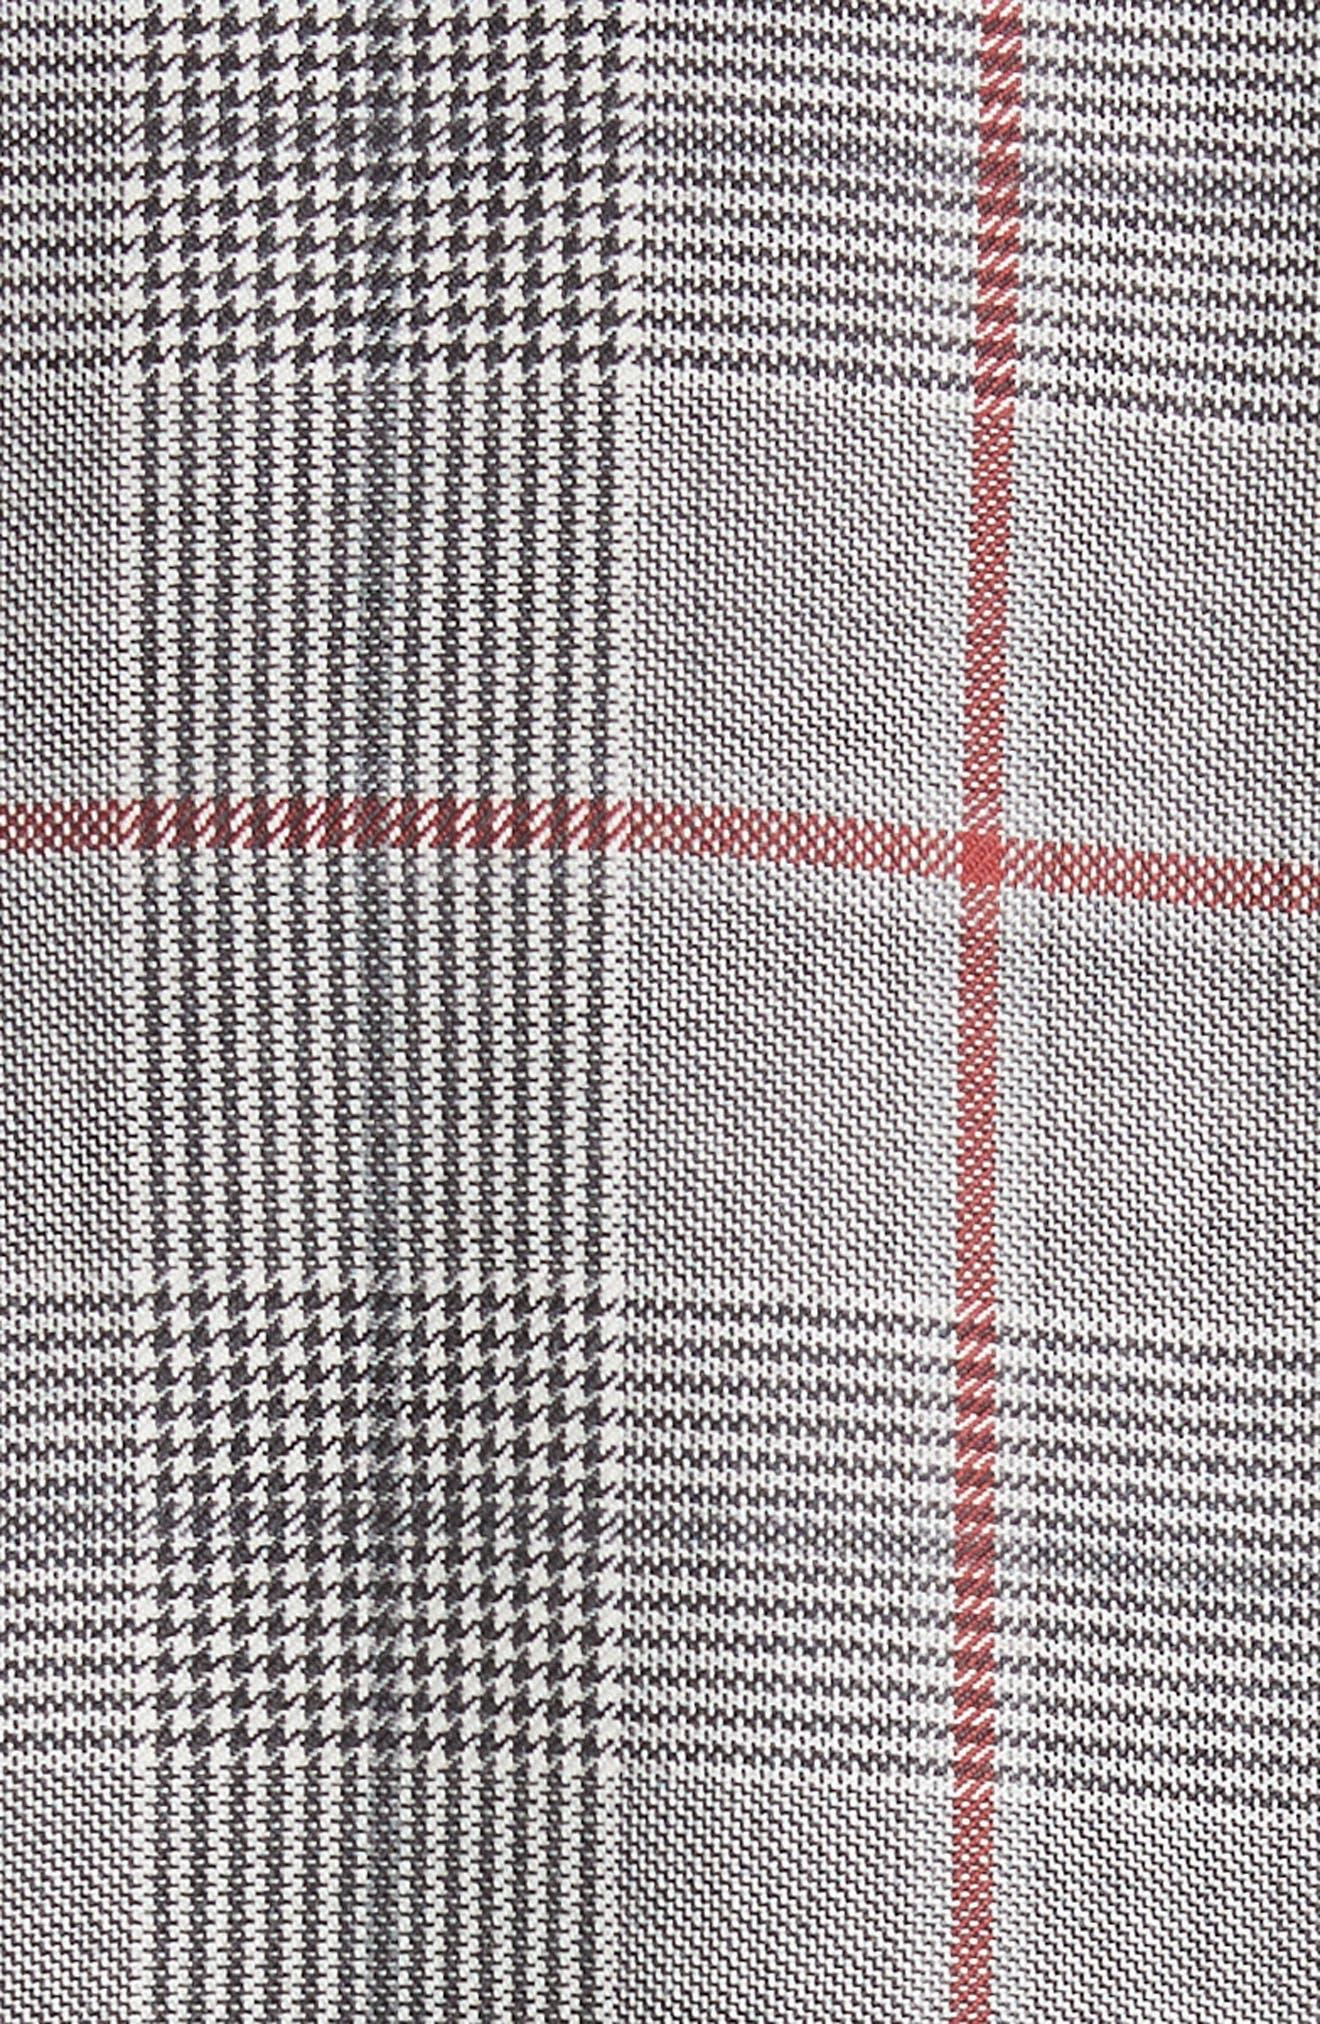 Plaid Wool Jacket,                             Alternate thumbnail 7, color,                             BLACK WHITE GRENADINE